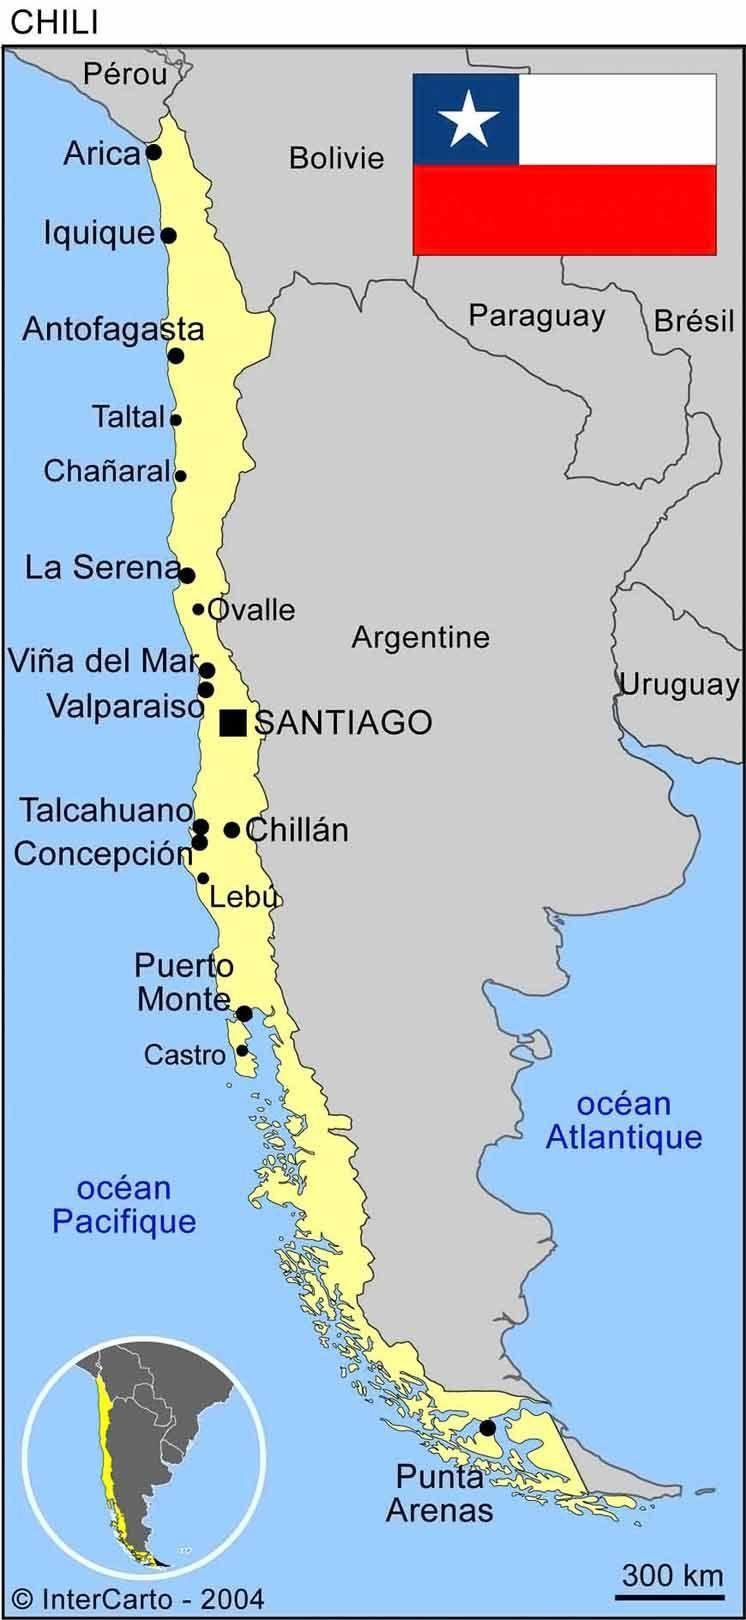 Chili - Map